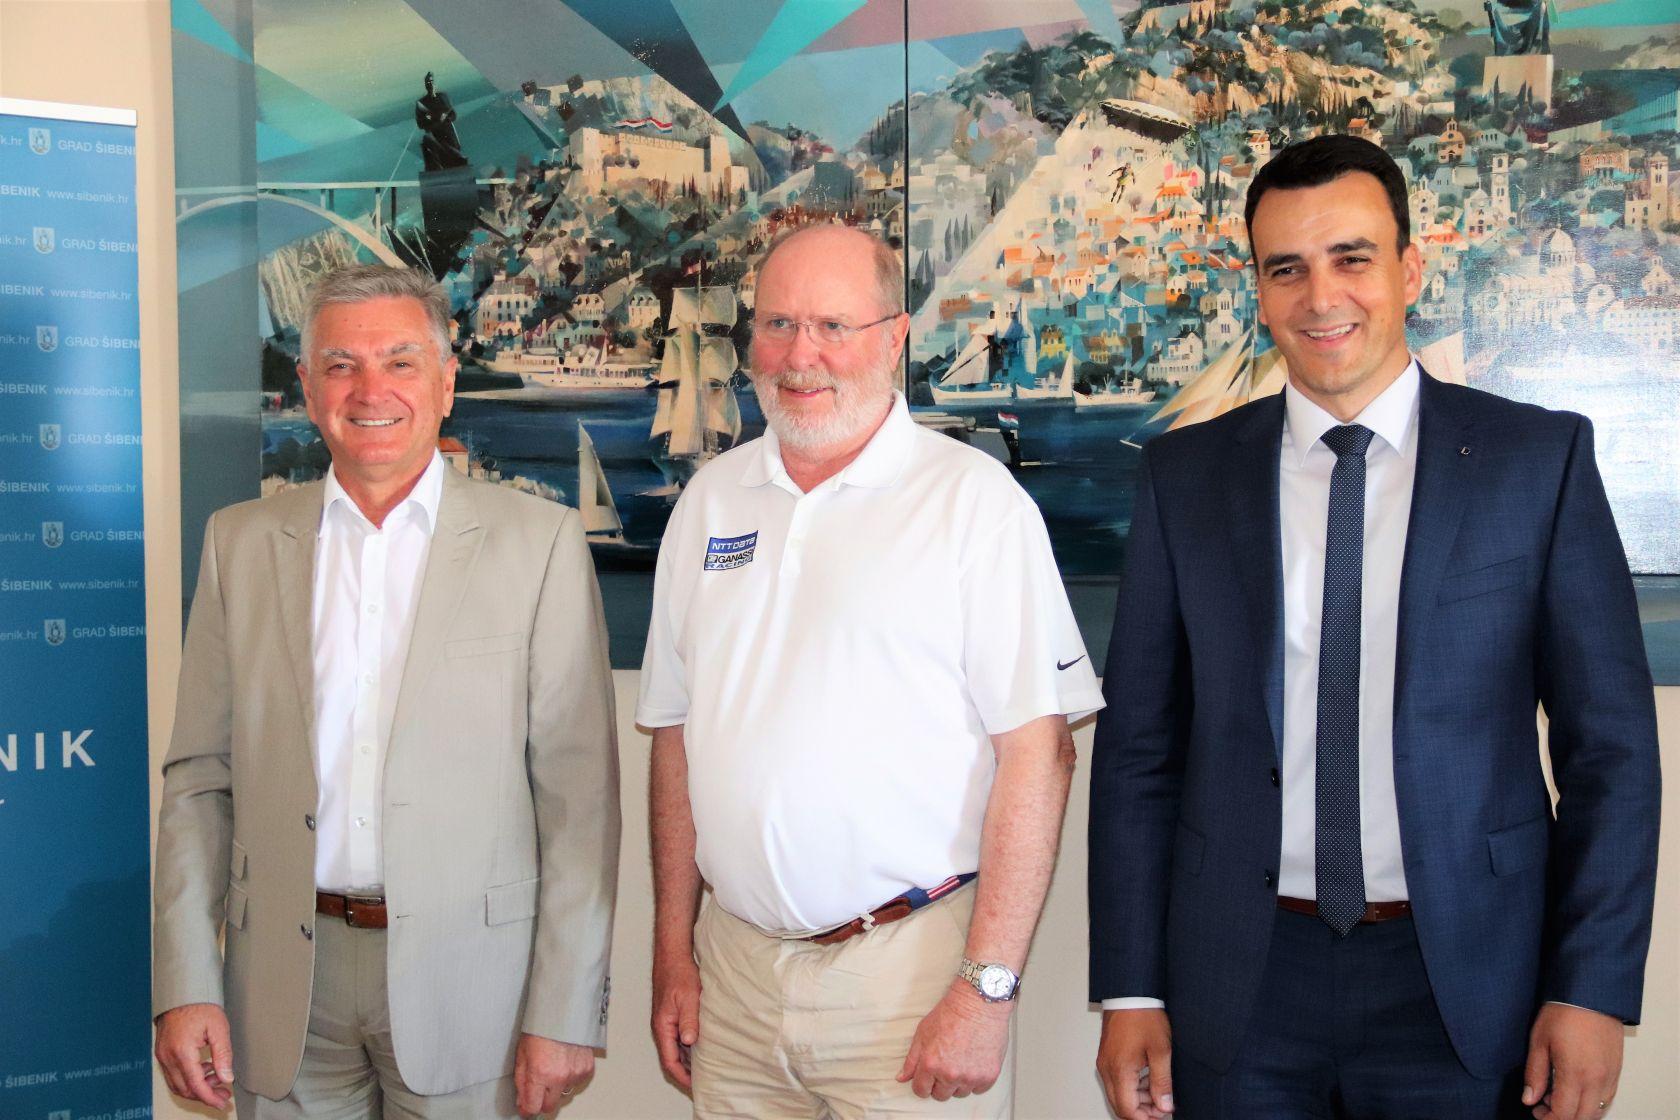 Američki veleposlanik Robert W. Kohorst posjetio Šibenik